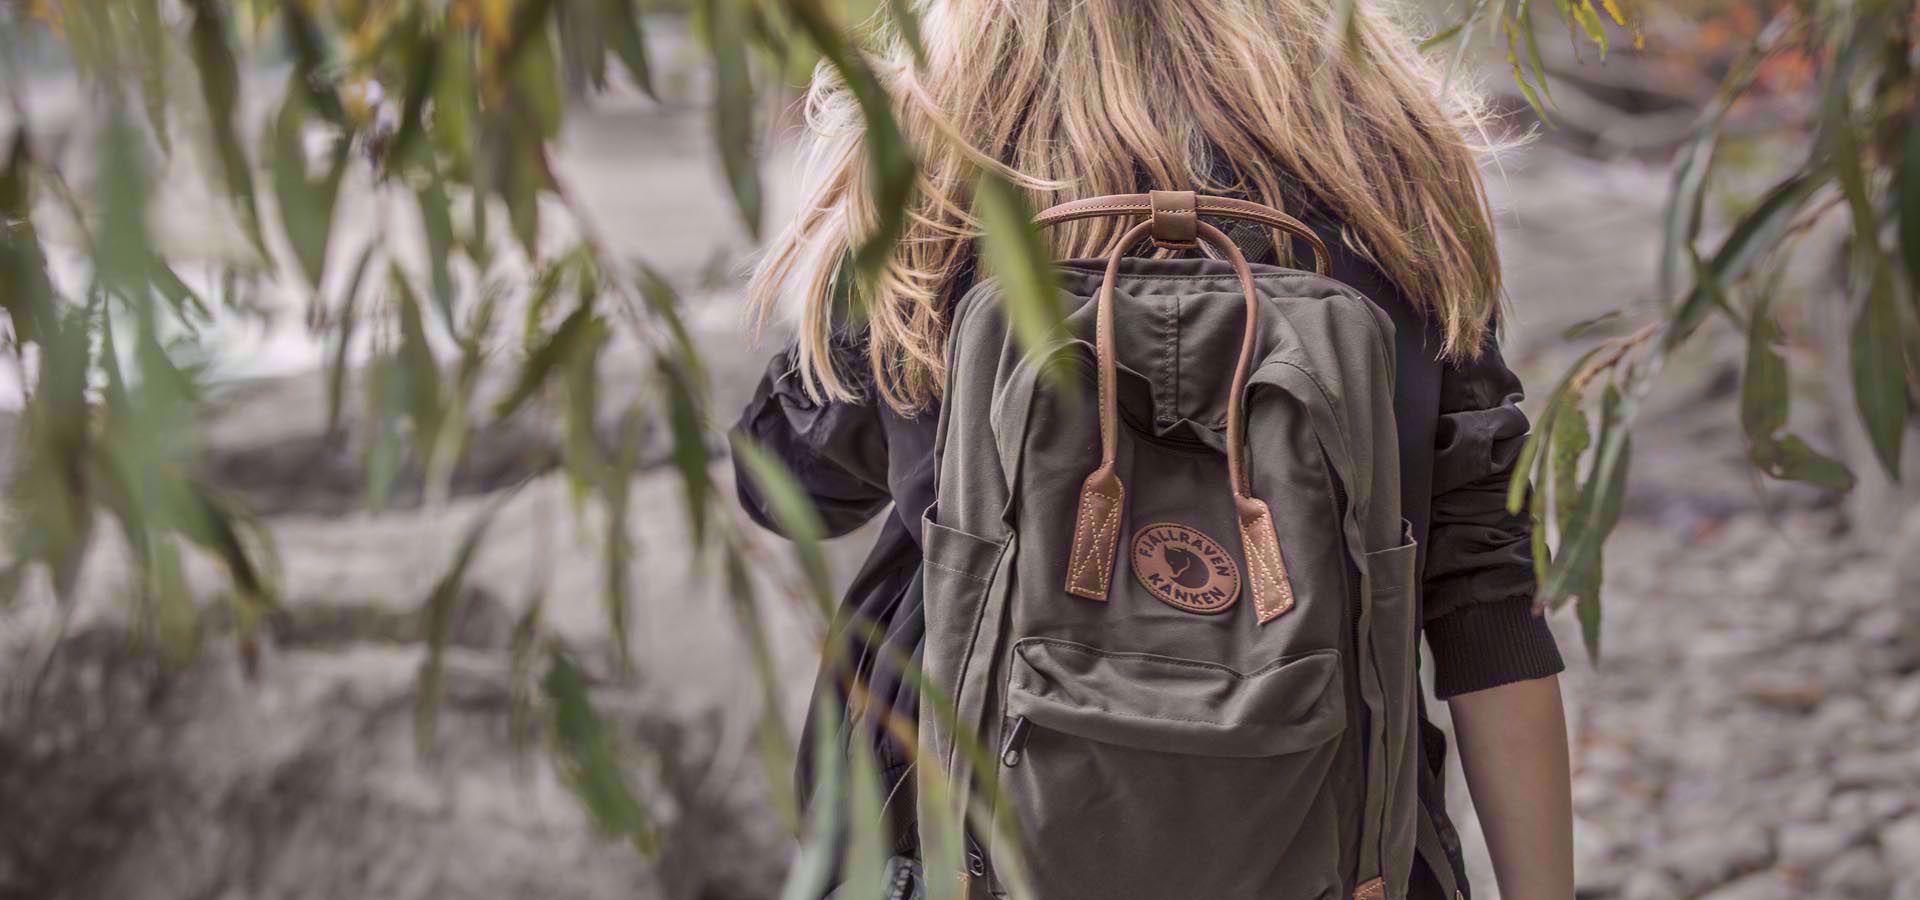 Backpacking for women: Multifunction keeps it light